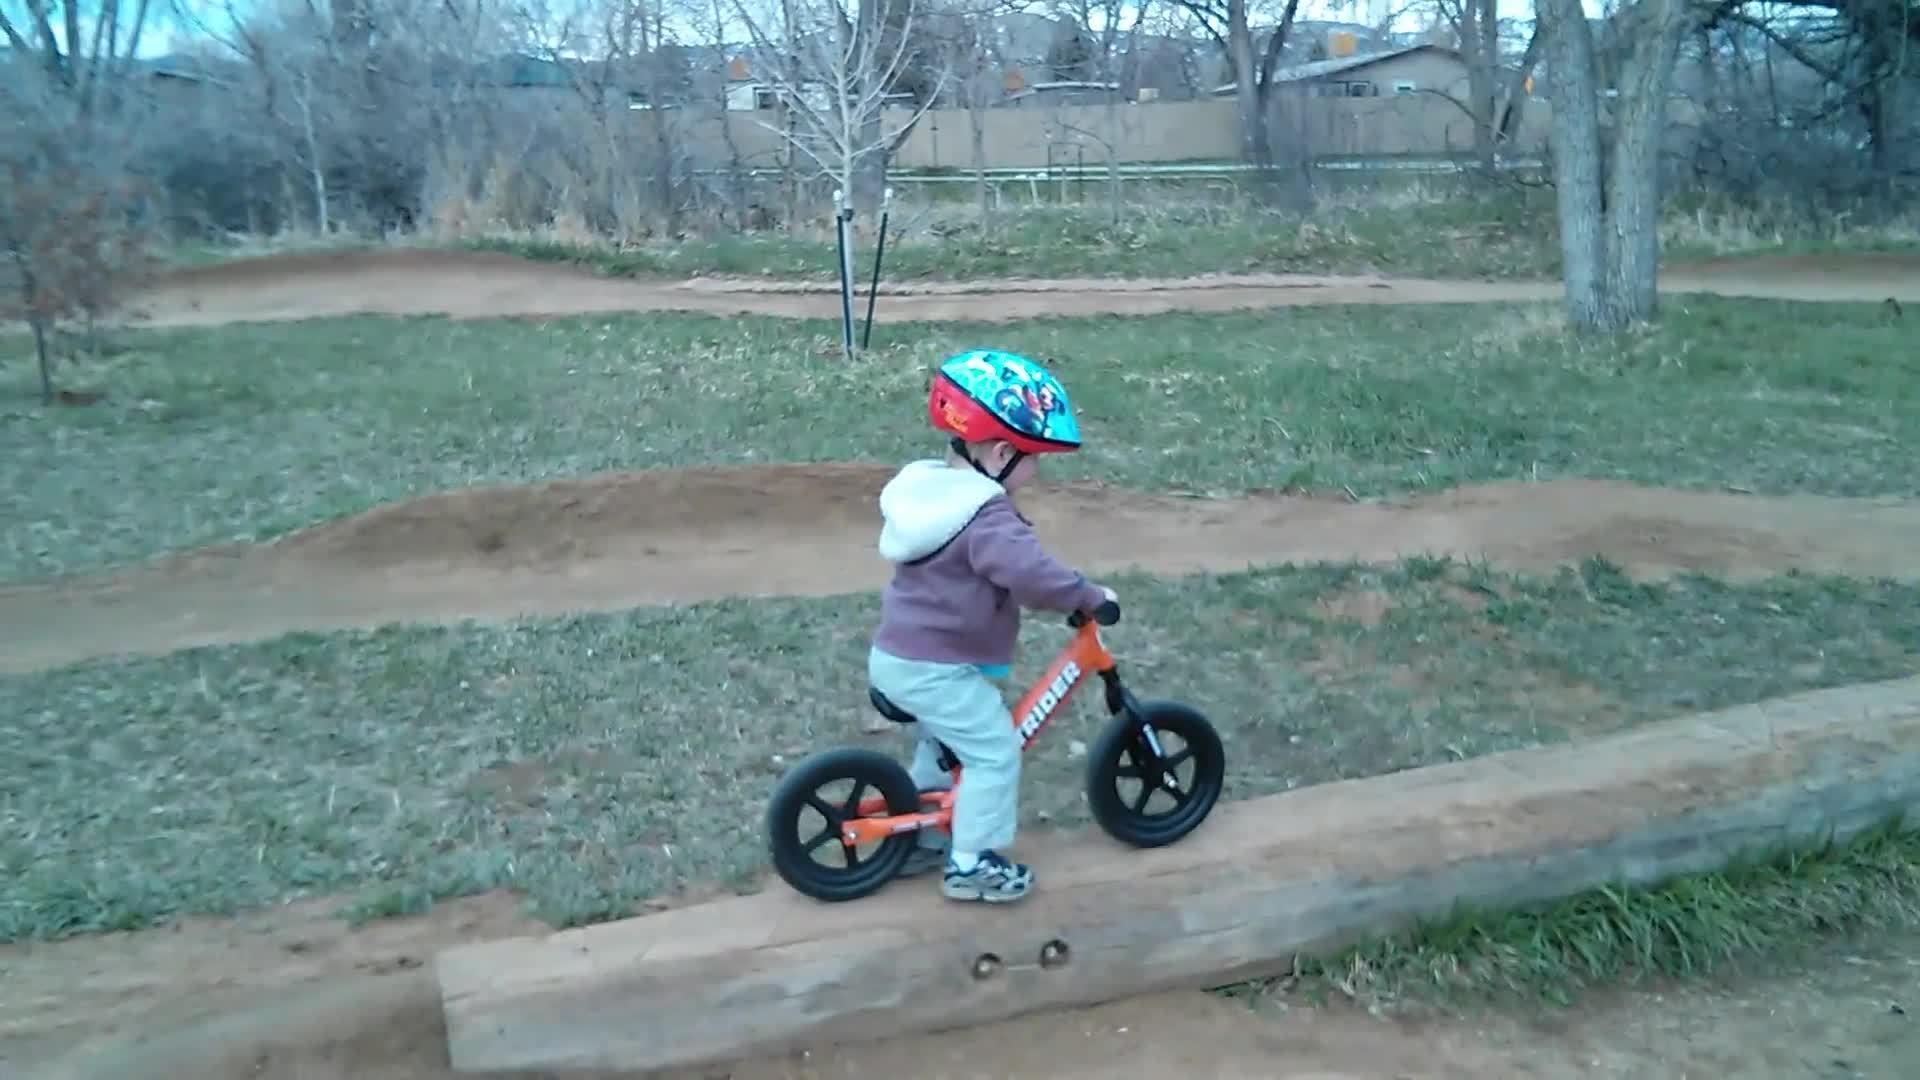 ChildrenFallingOver, gifsthatendtoosoon, holdmyjuicebox, Rhys Biking Over a Log GIFs